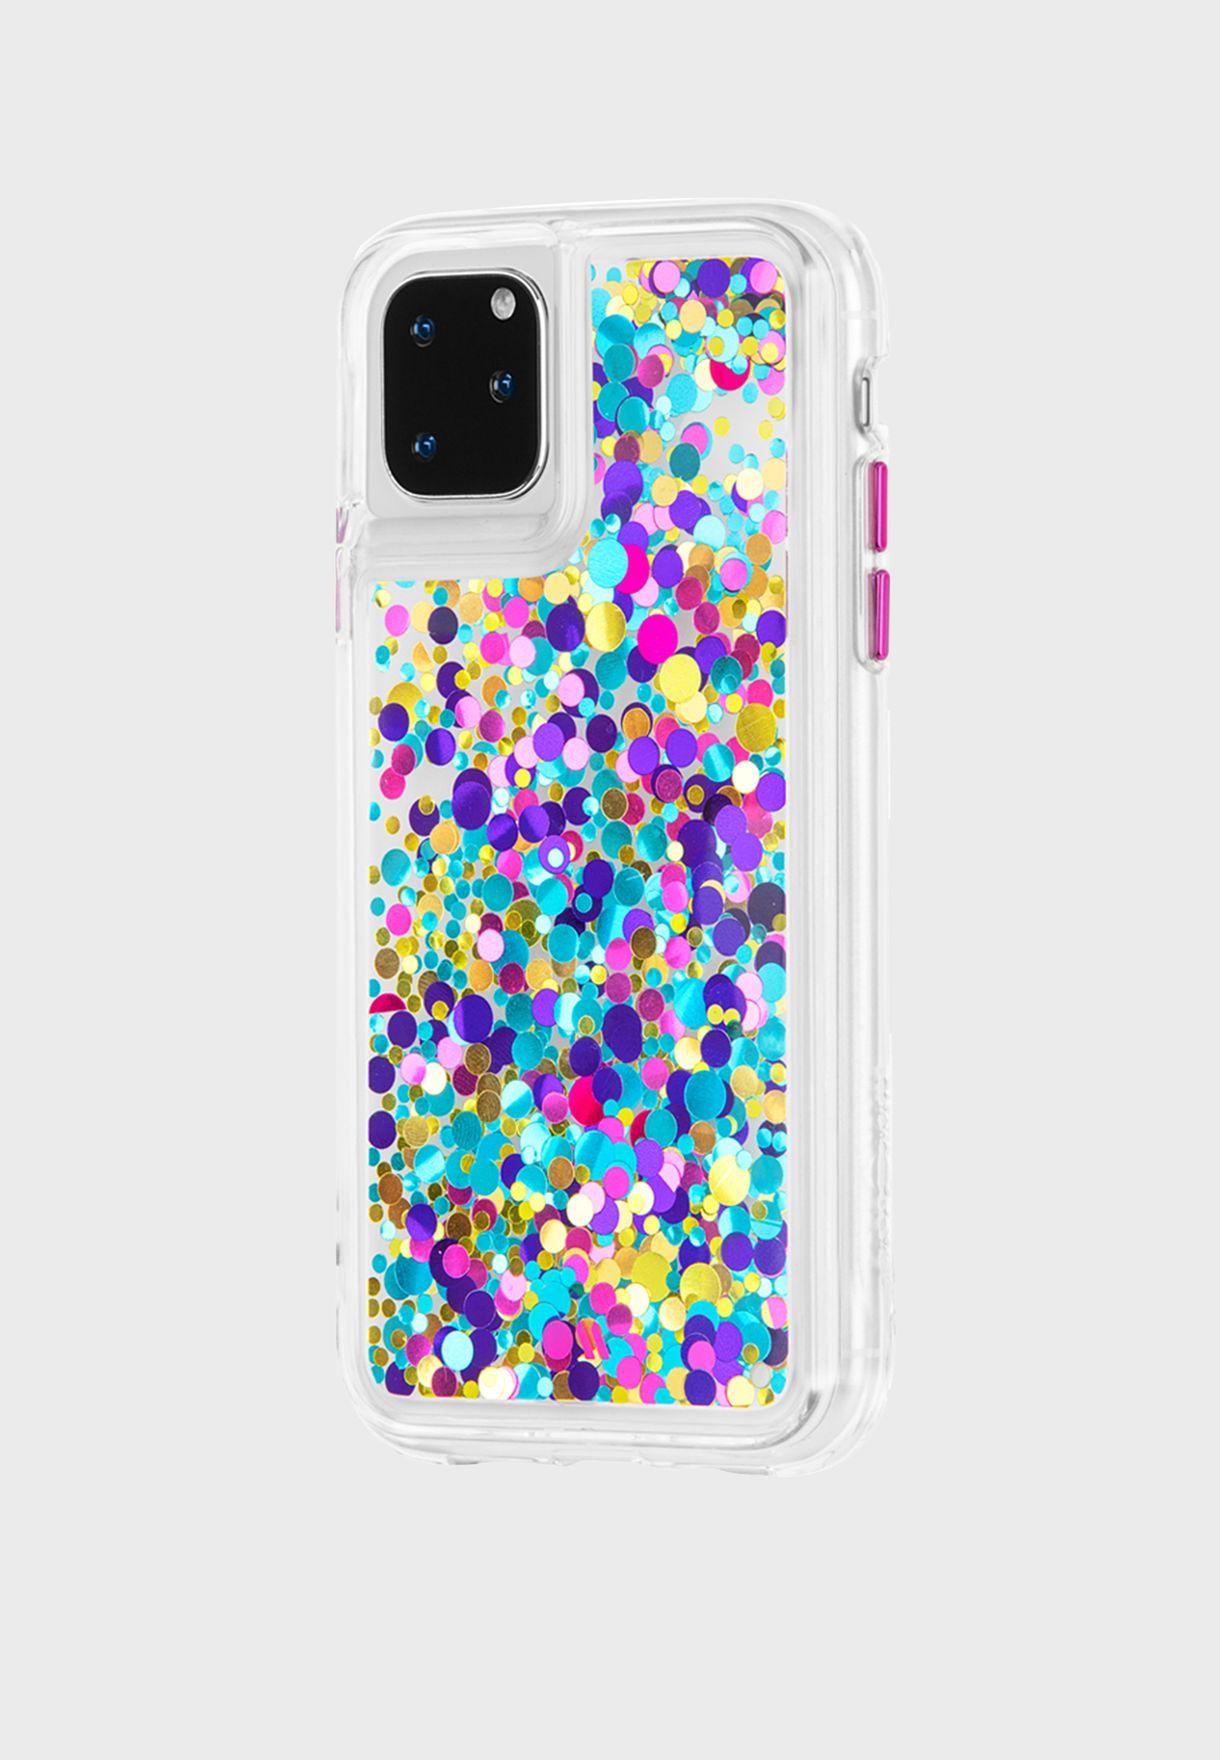 Waterfall Confetti iPhone 11 Pro/11 Pro Max Case